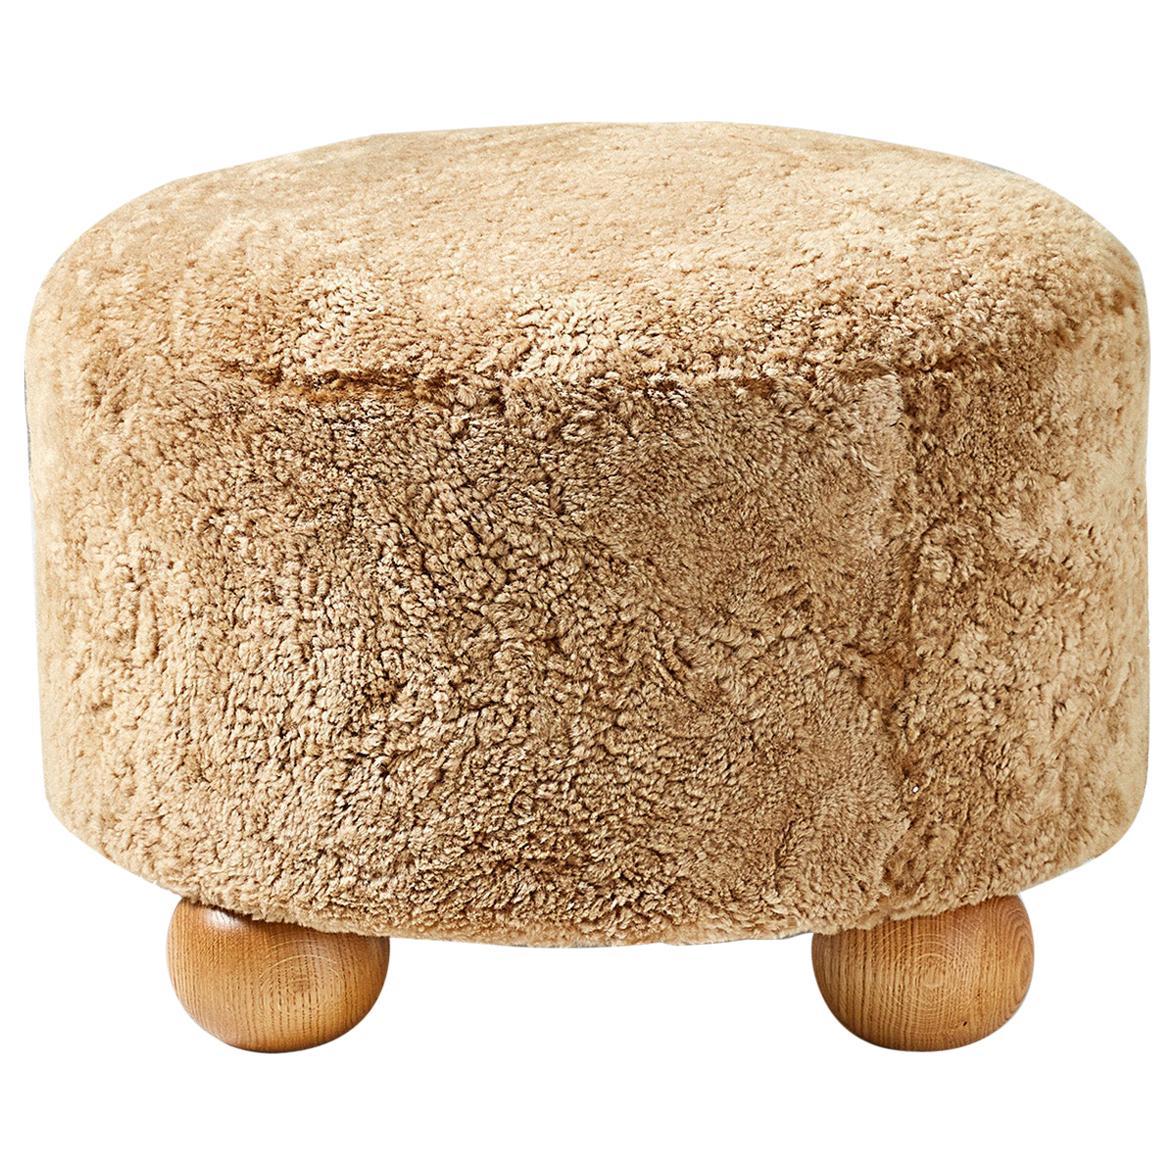 Custom Made Round Sheepskin Ottoman with Oak Ball Feet